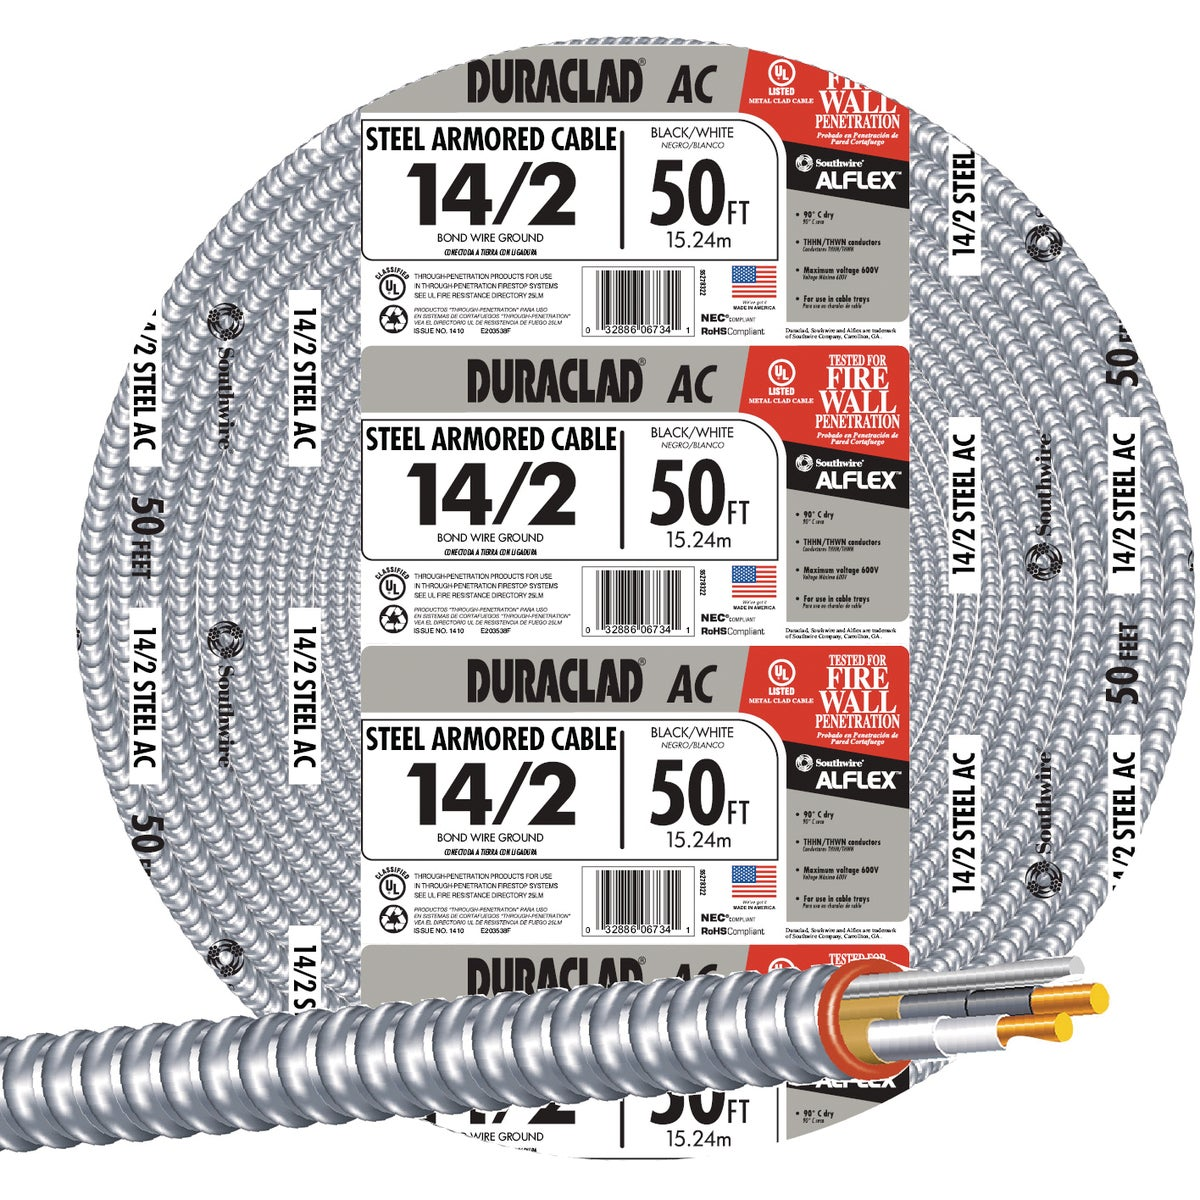 50' 14/2 STL ARMOR CABLE